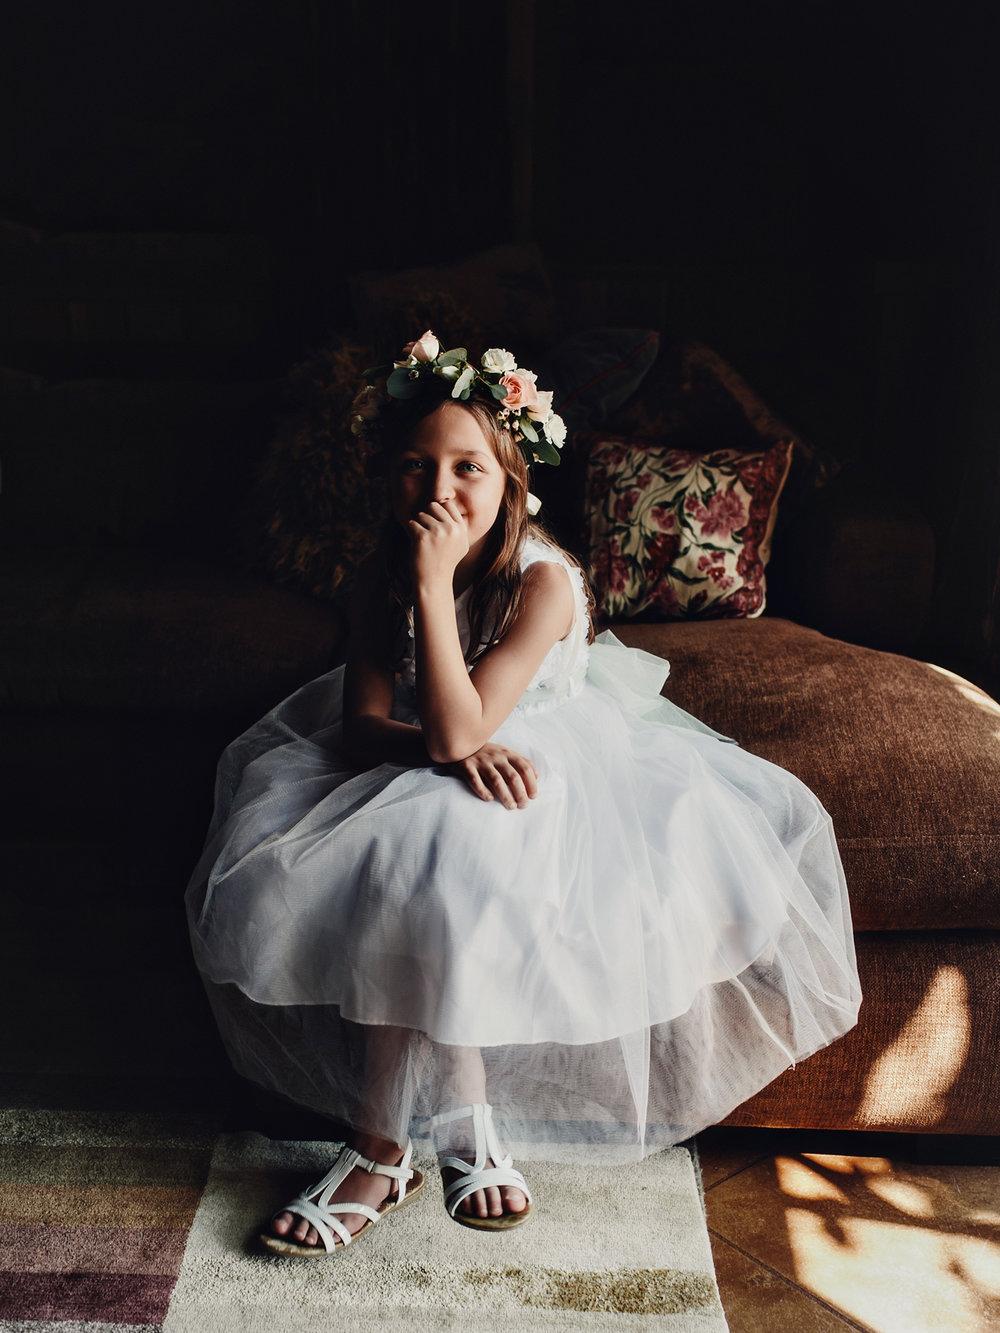 taylorroades-wedding-photographer-vancouver-0366.jpg